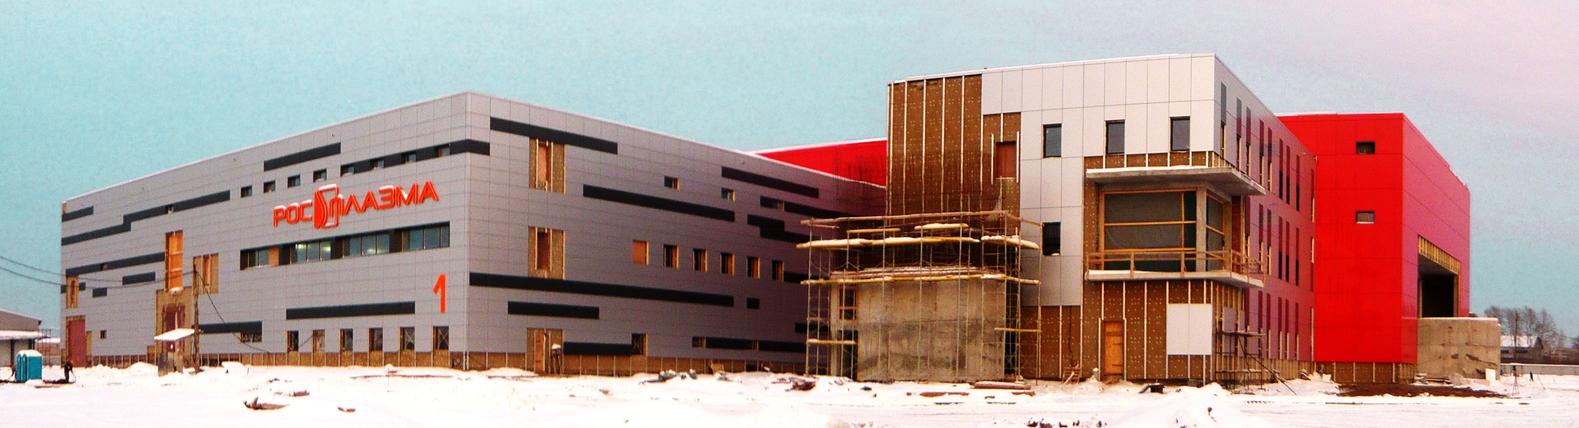 Plasmaproduktion Kirov